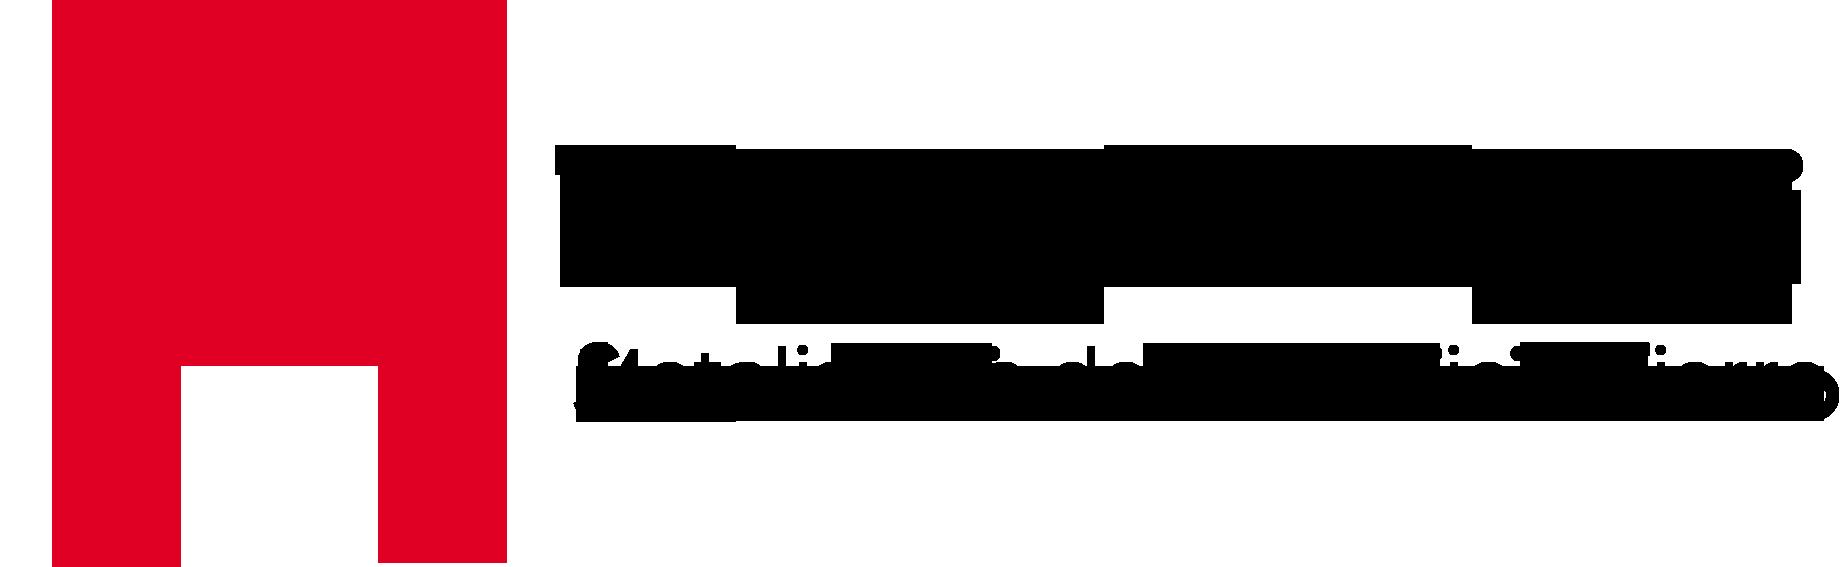 TanquiTanqui Logo